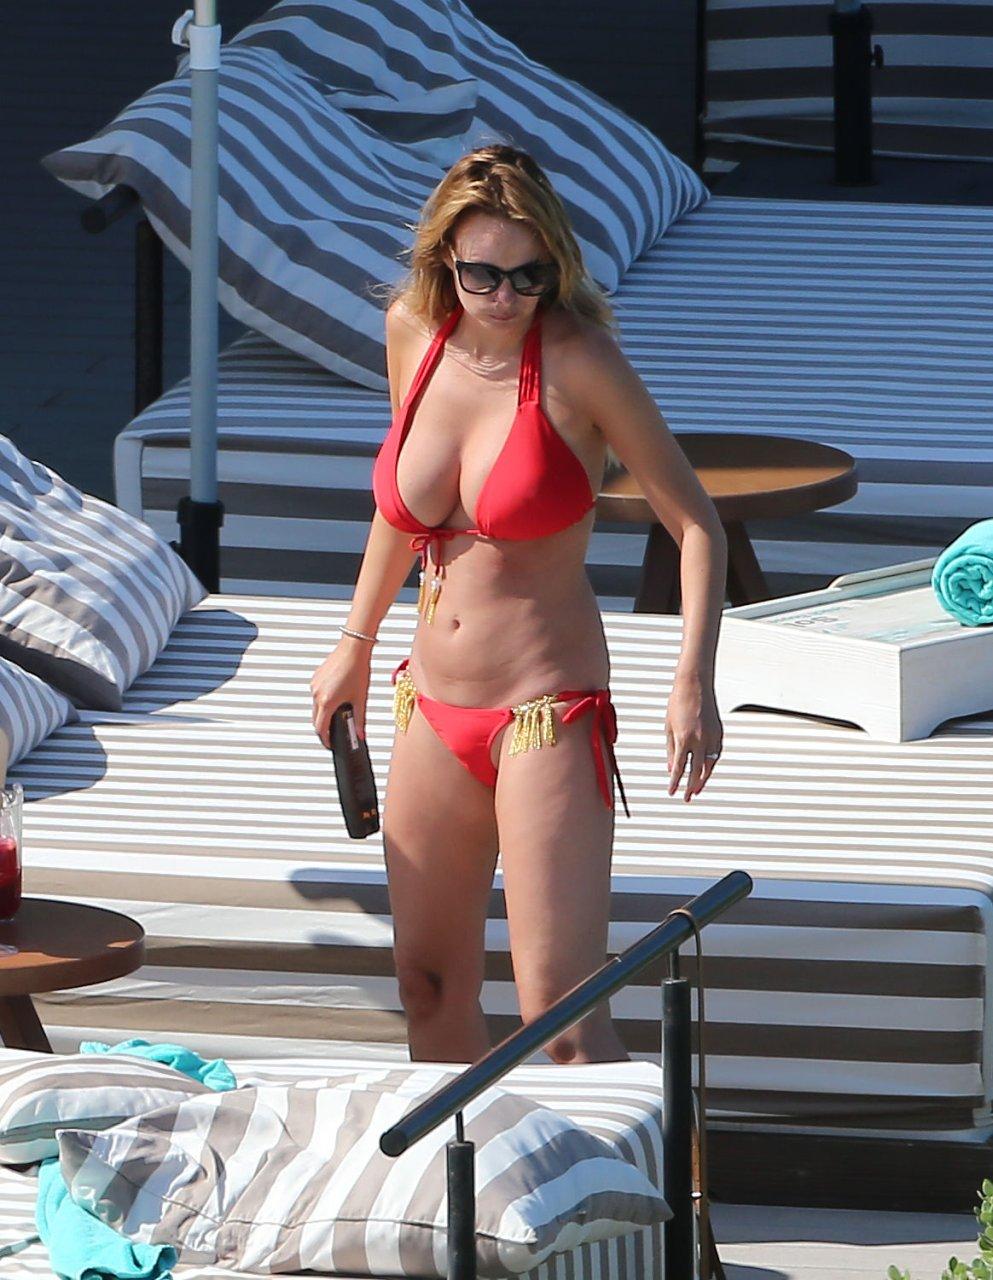 Rhian-Sugden-Sexy-Topless-TheFappeningBlog.com-39.jpg